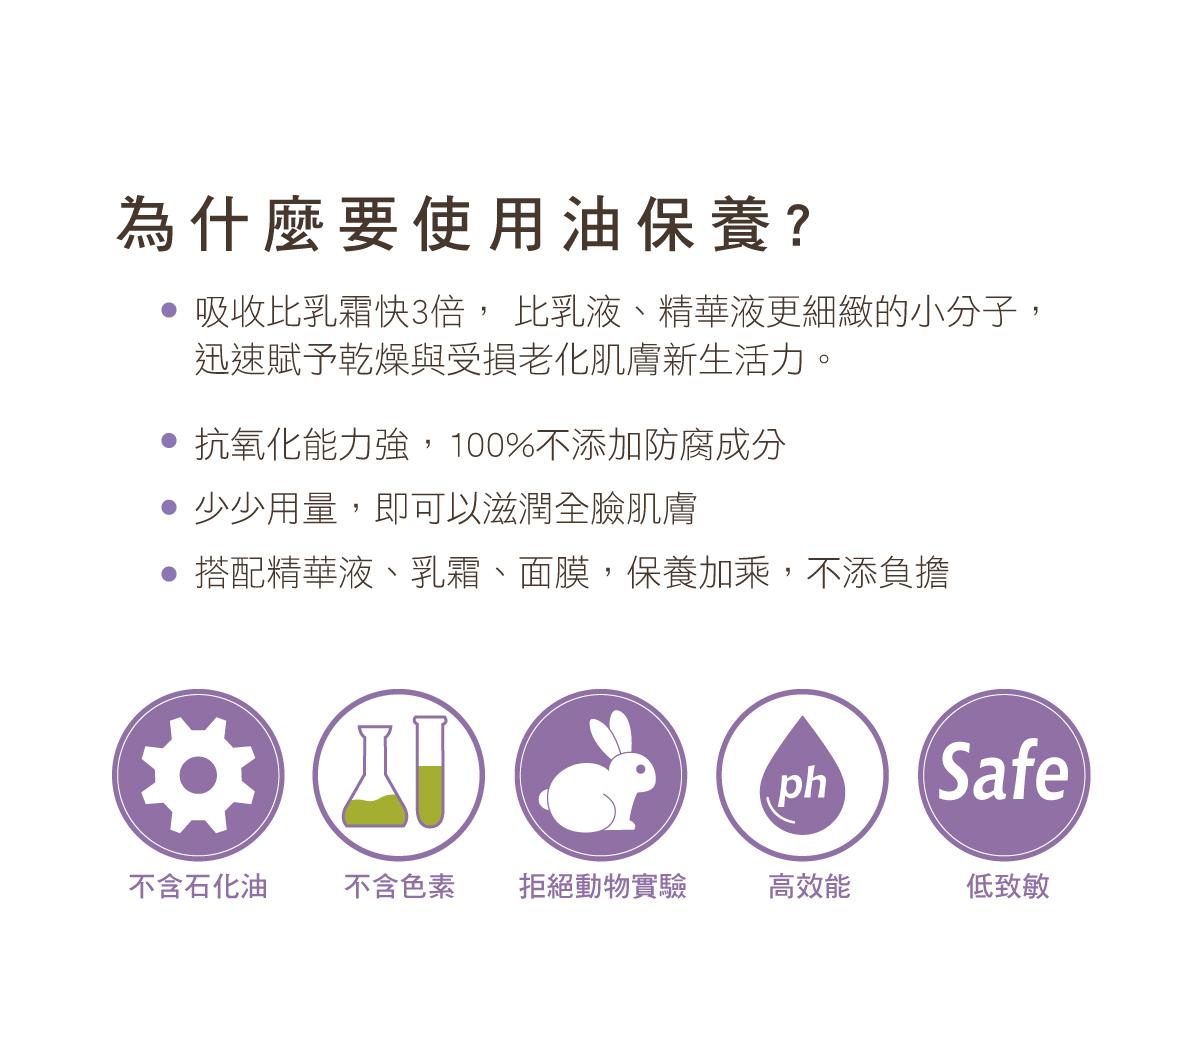 MYMASY, 全效植感修護油, 美容油推薦, 油類保養, MYMASY哪裡買, 修護油, 修護保養, 油類保養推薦, 髮油推薦, 試用, 體驗